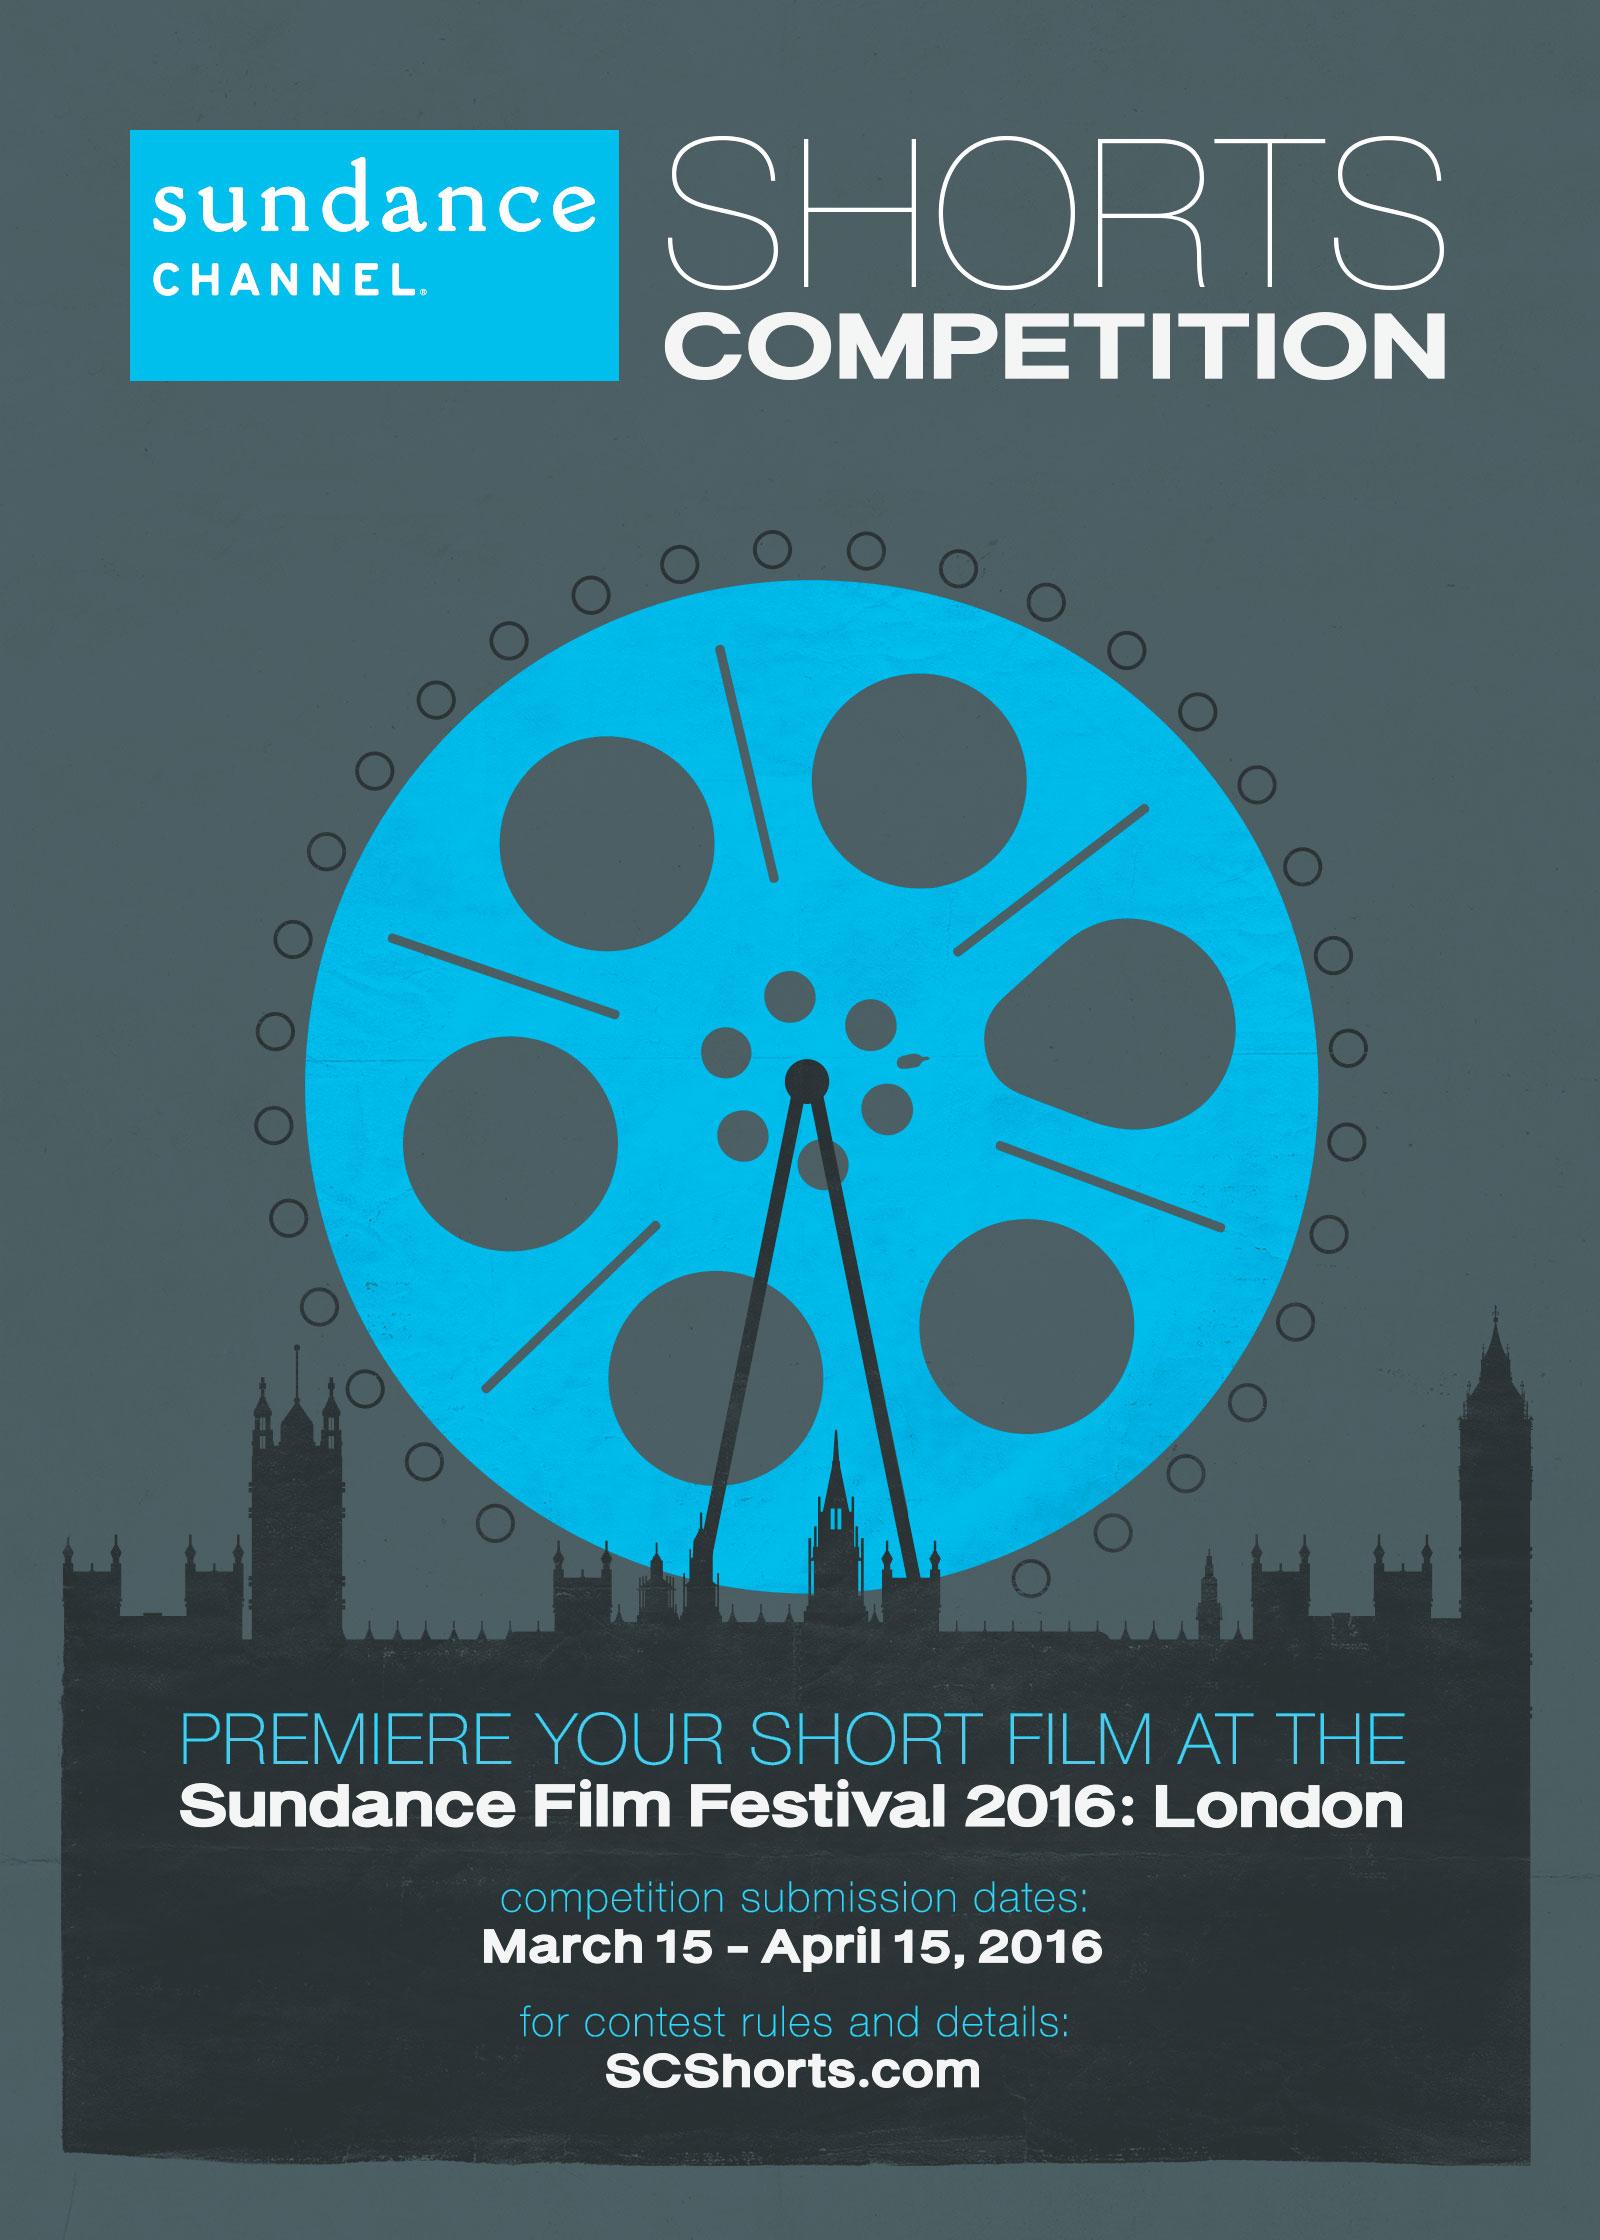 Sundance Channel Shorts Poster Emma Webb Design